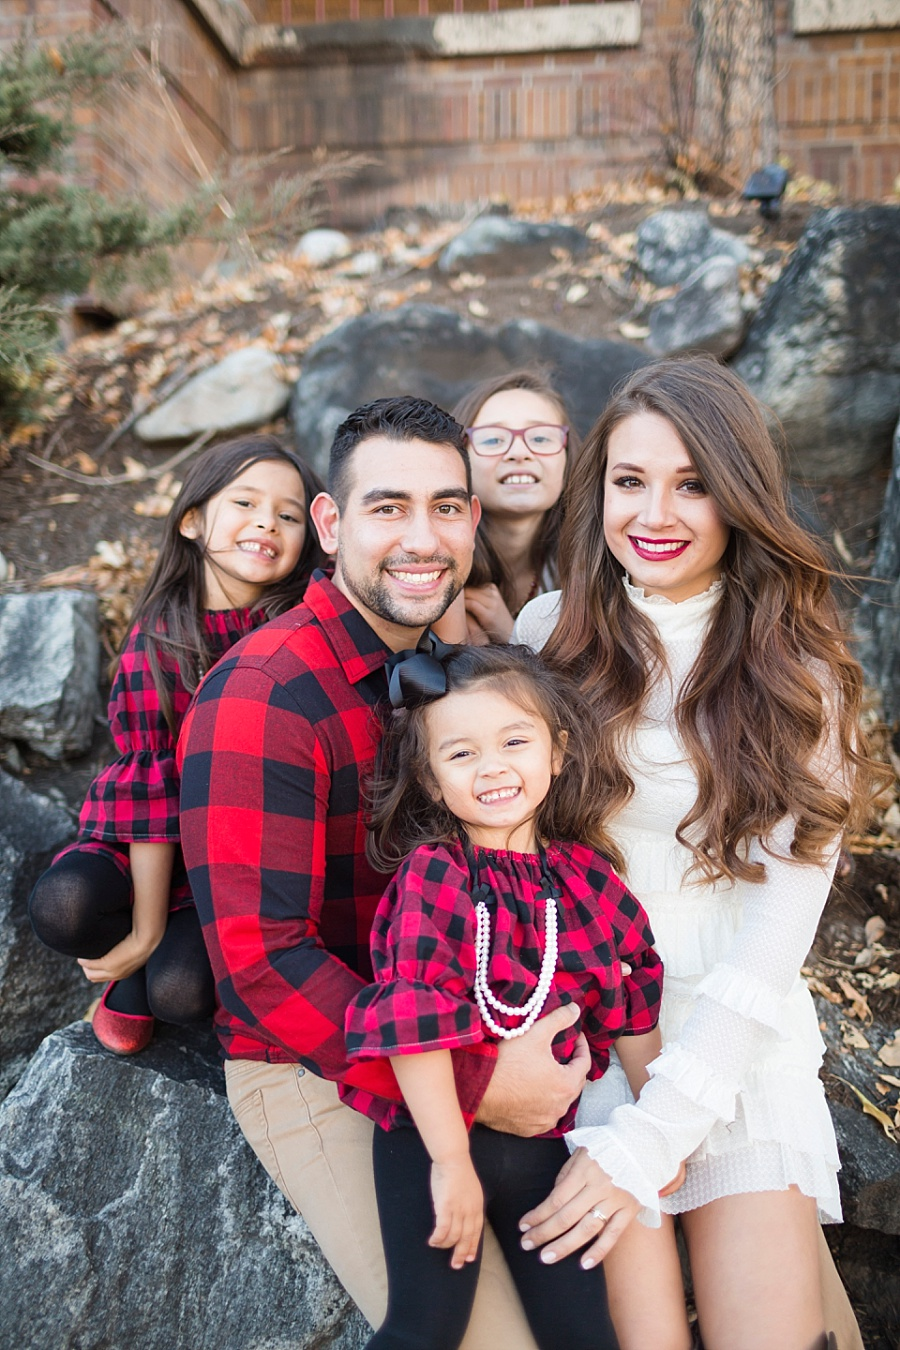 Stacy Anderson Photography Breckenridge Denver Boulder Vail Colorado Travel Lifestyle Elopement Vow renewal Family Wedding Photographer_0007.jpg